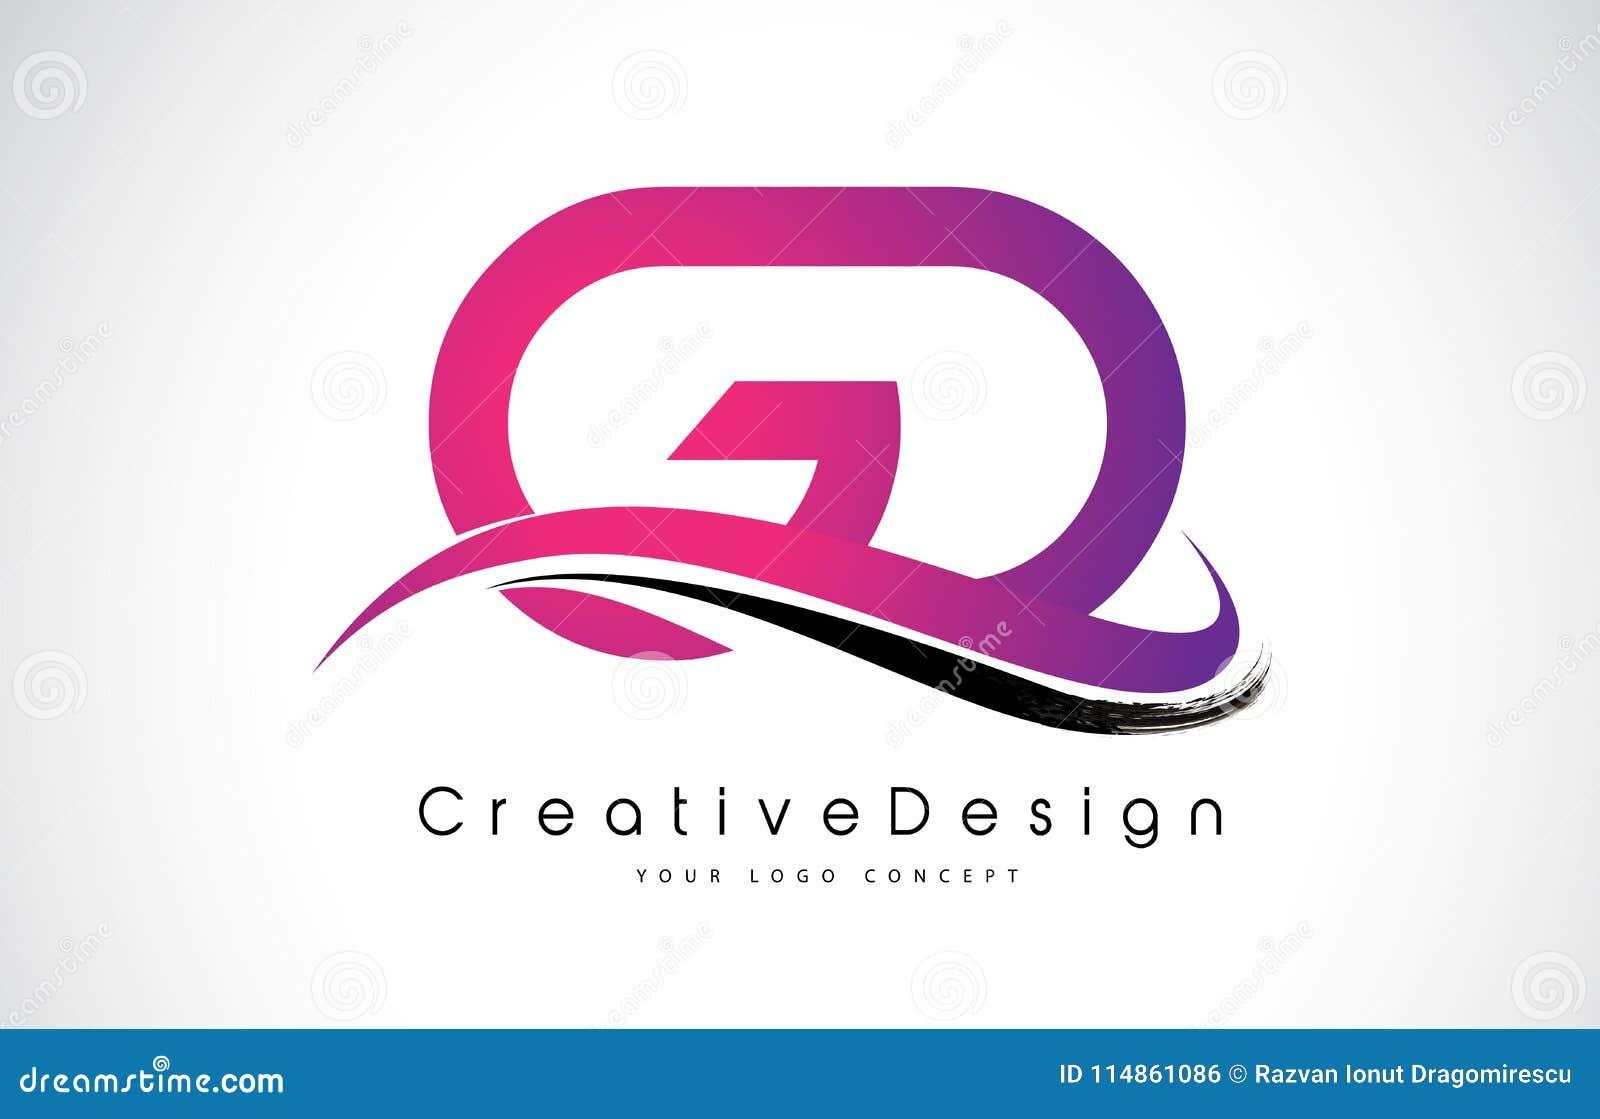 Gd Modern Business Letter Logo Design Stock Illustrations – 86 Gd ...